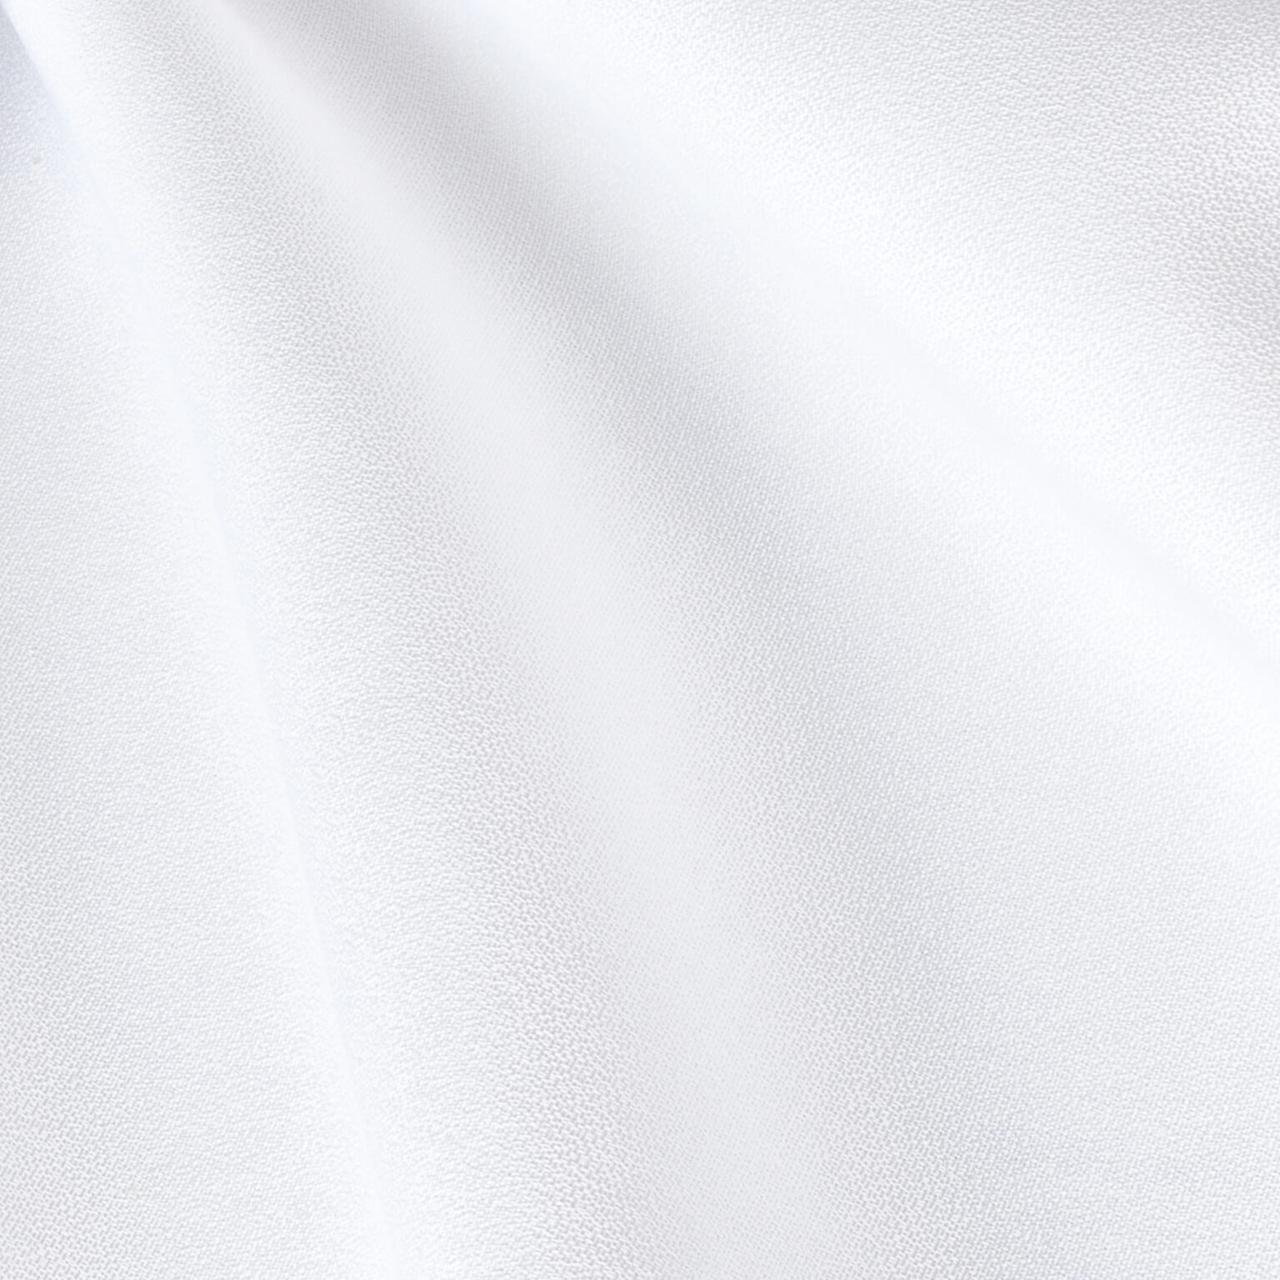 Ткань для скатертей и салфеток (ресторан) 83103v1